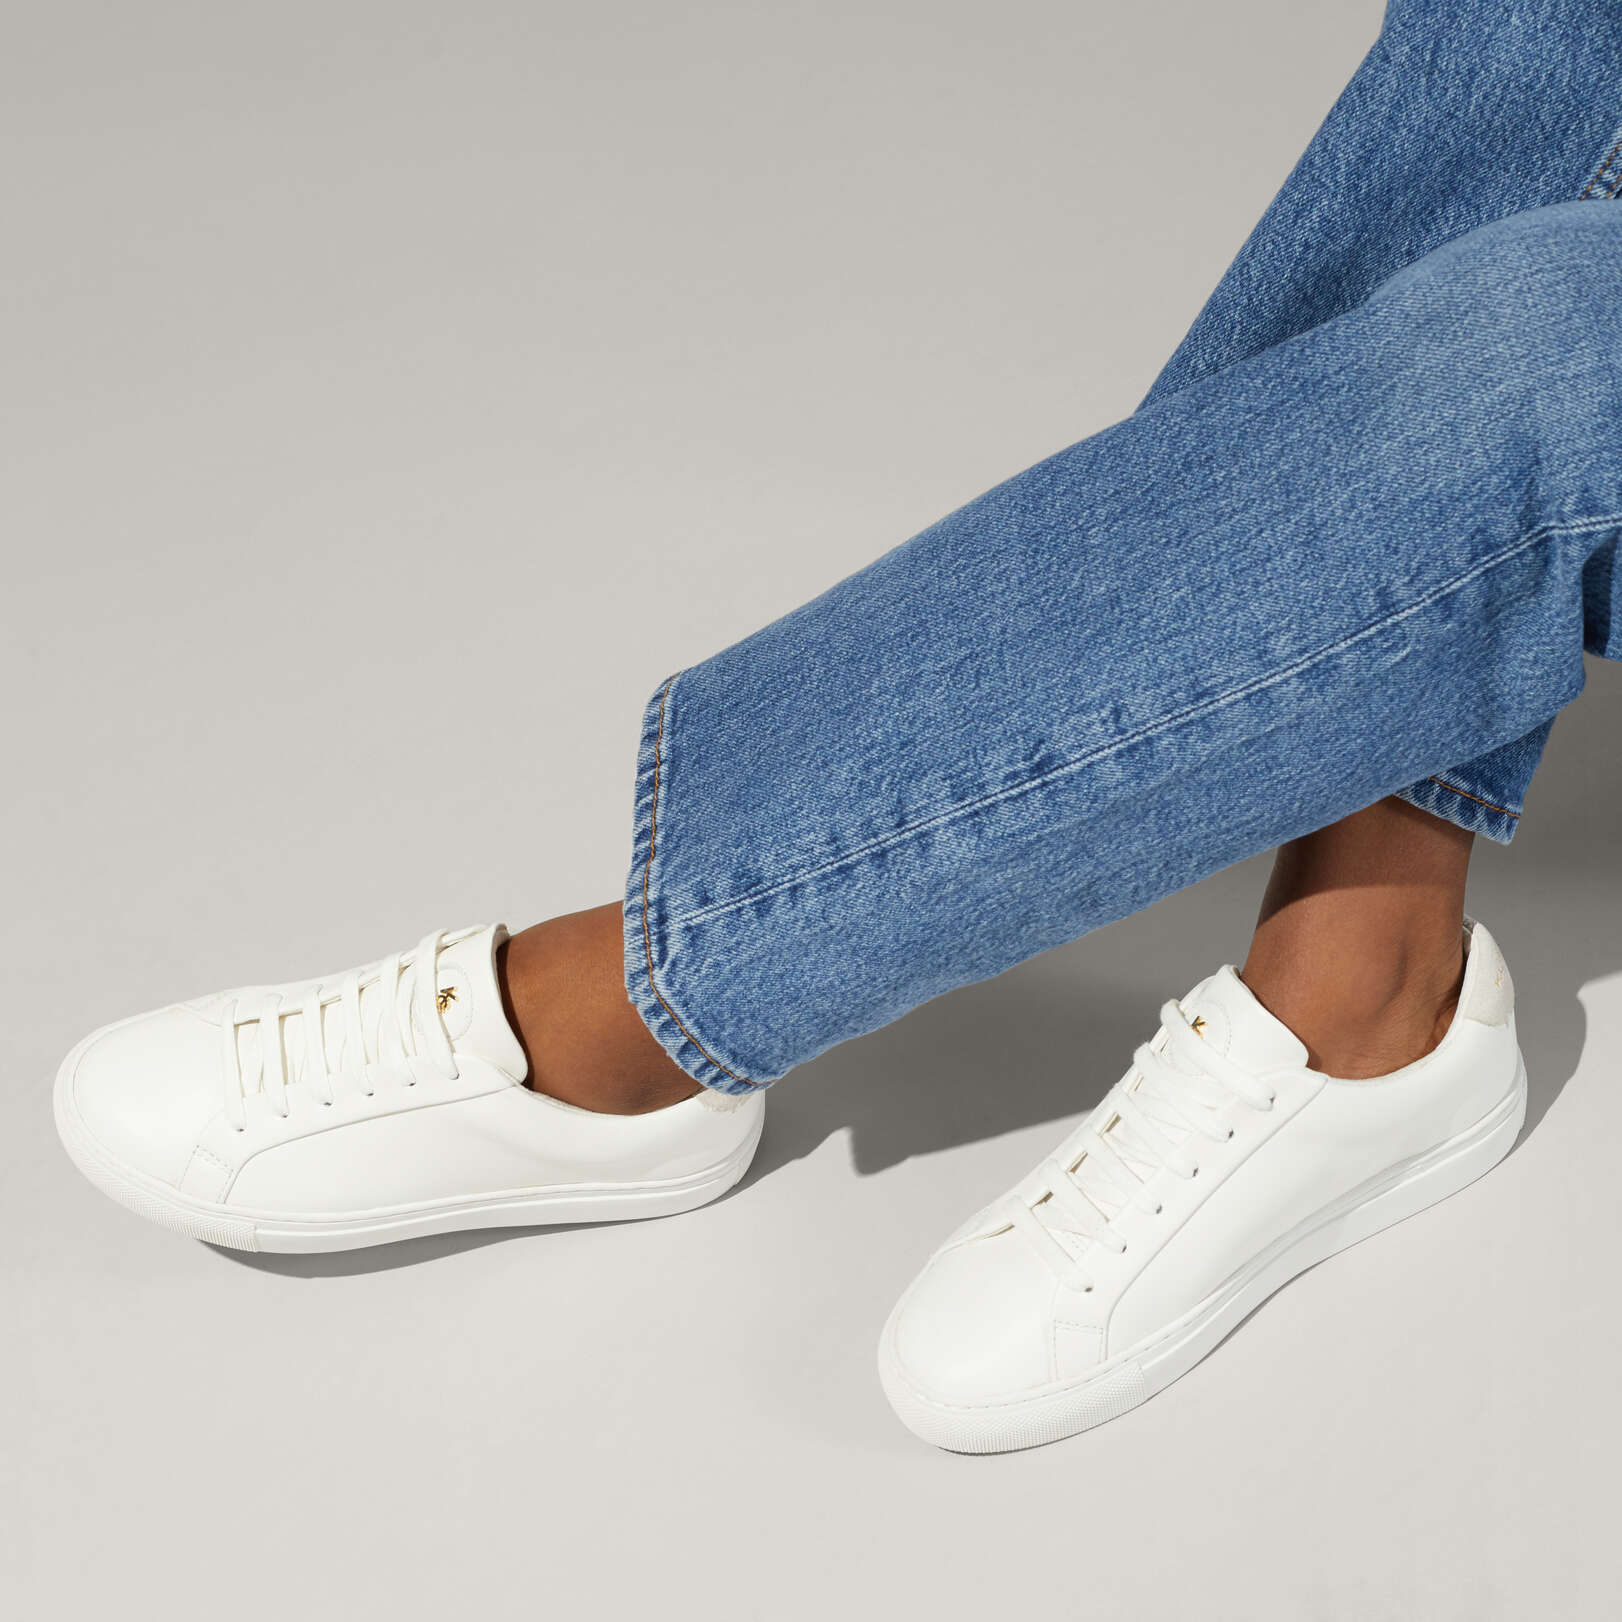 LANE KGL - KURT GEIGER LONDON Sneakers